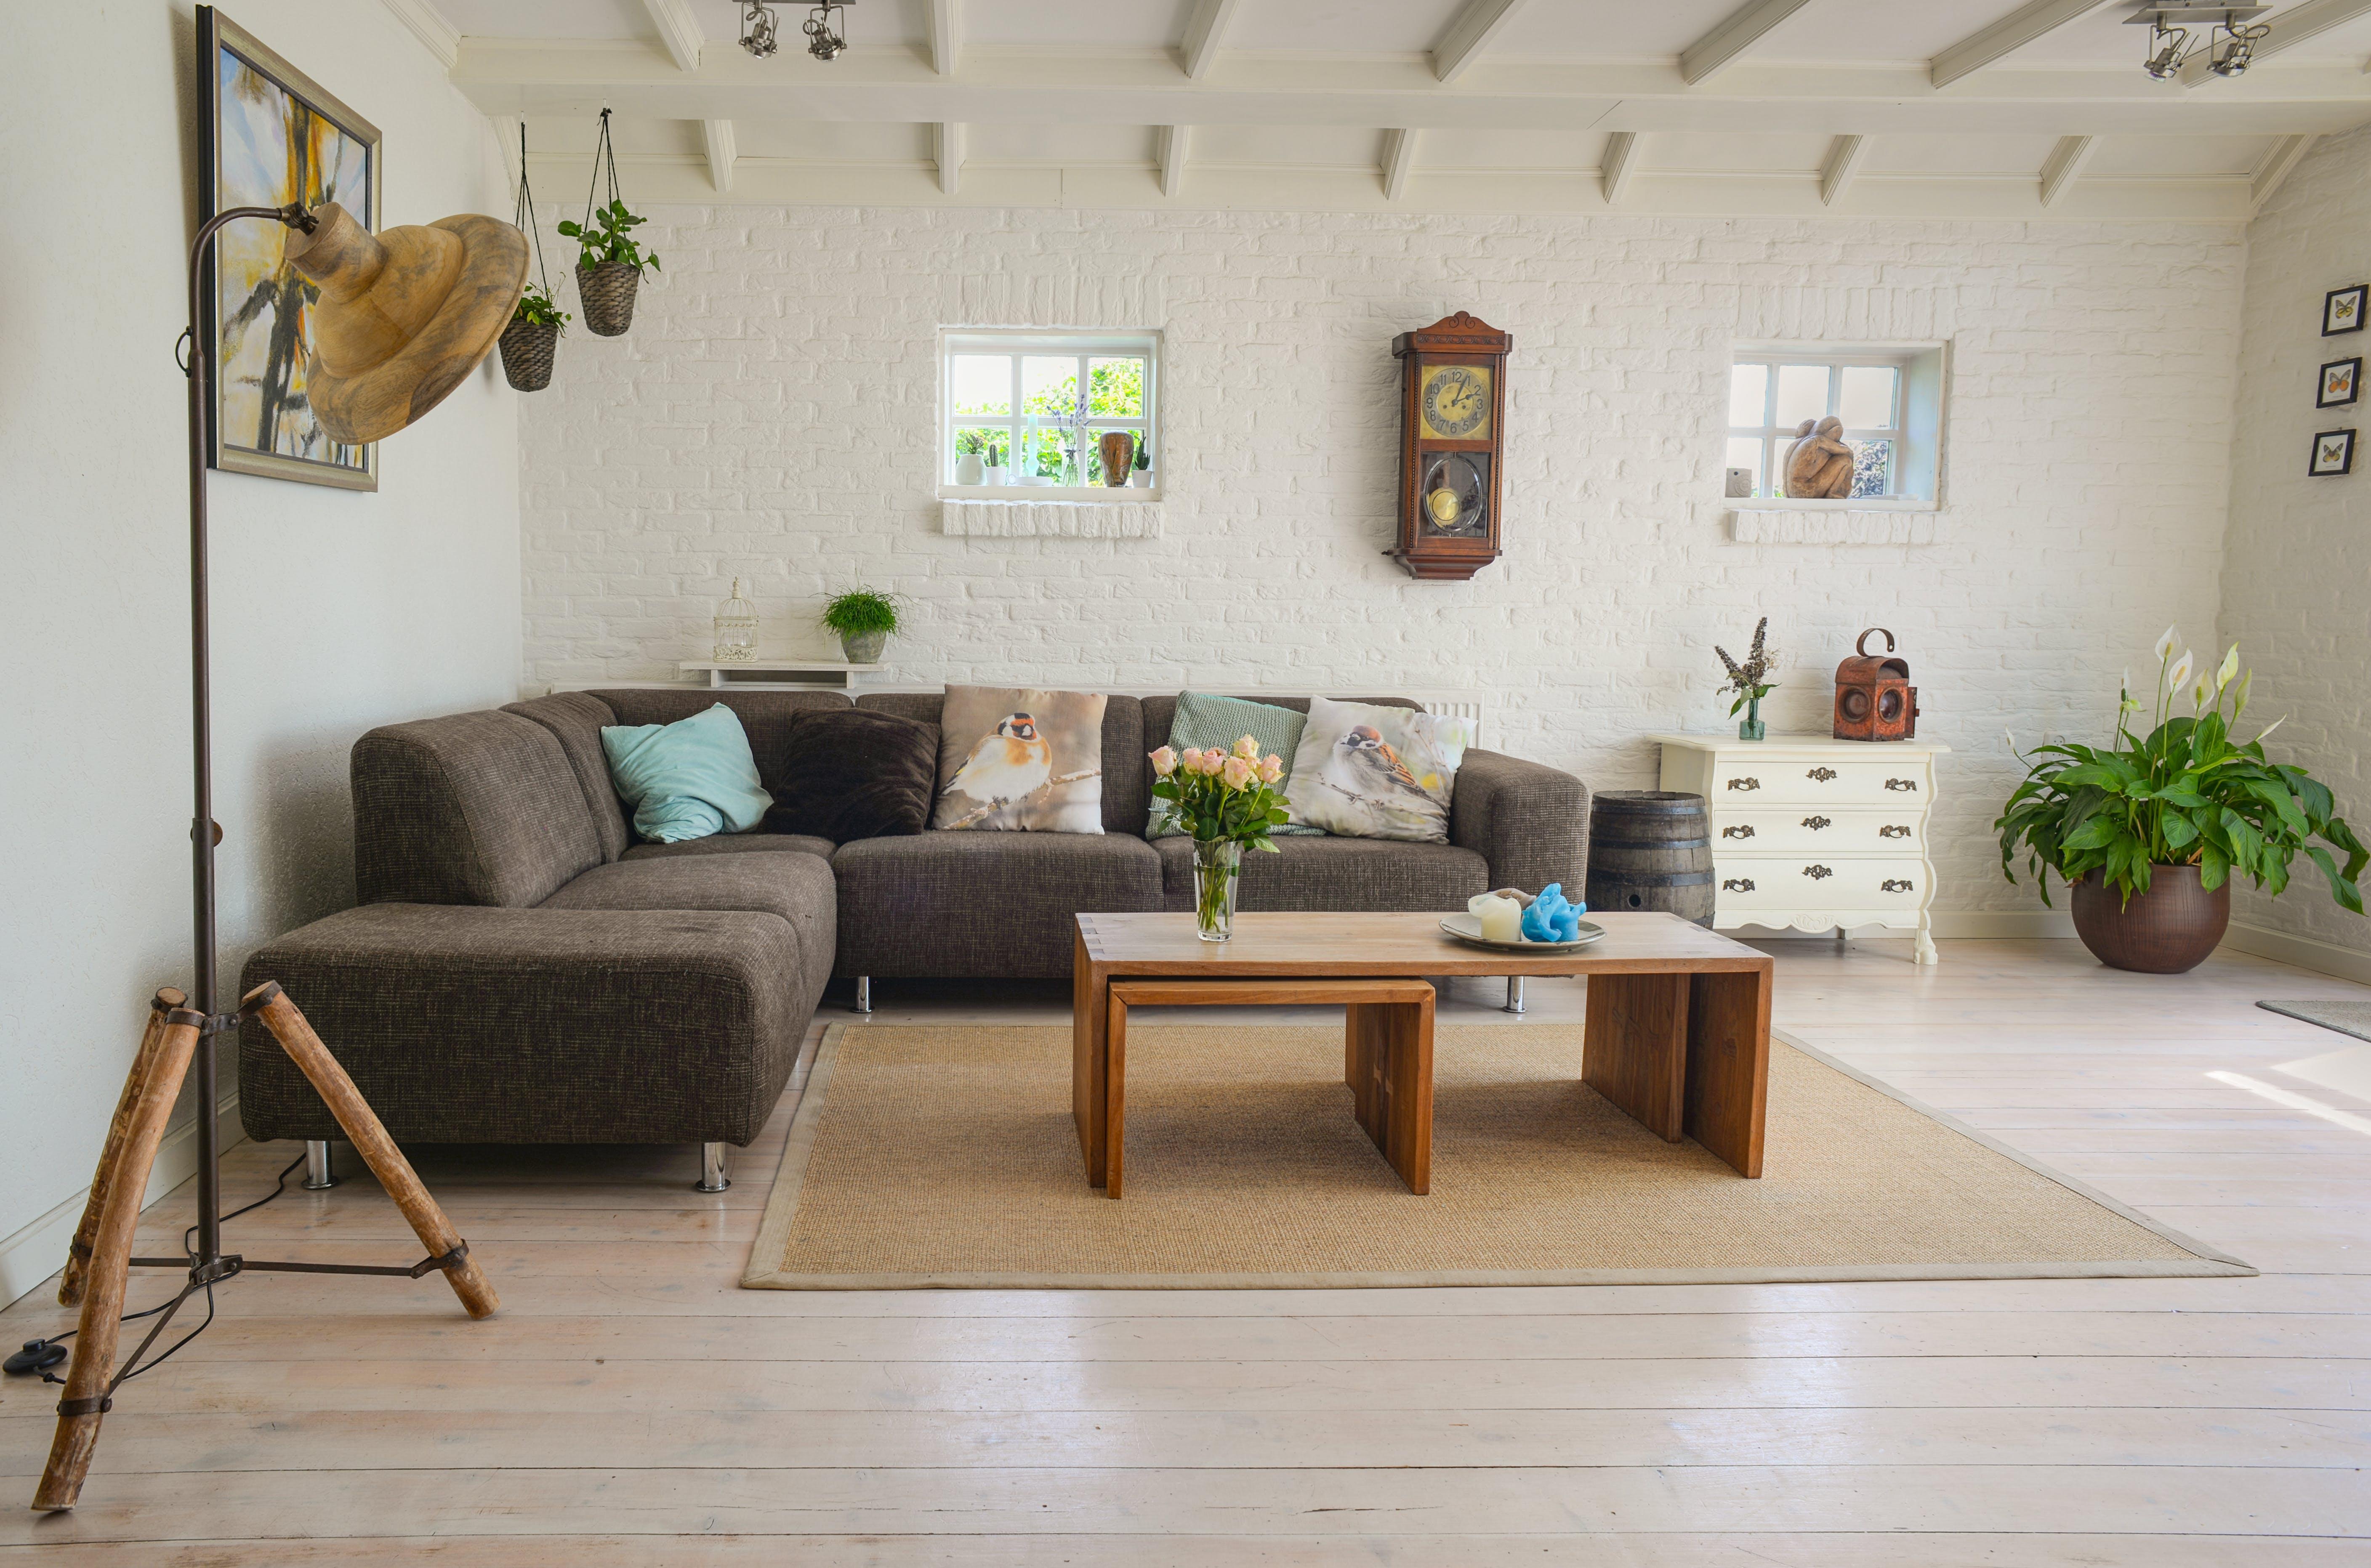 sofa, table, living room